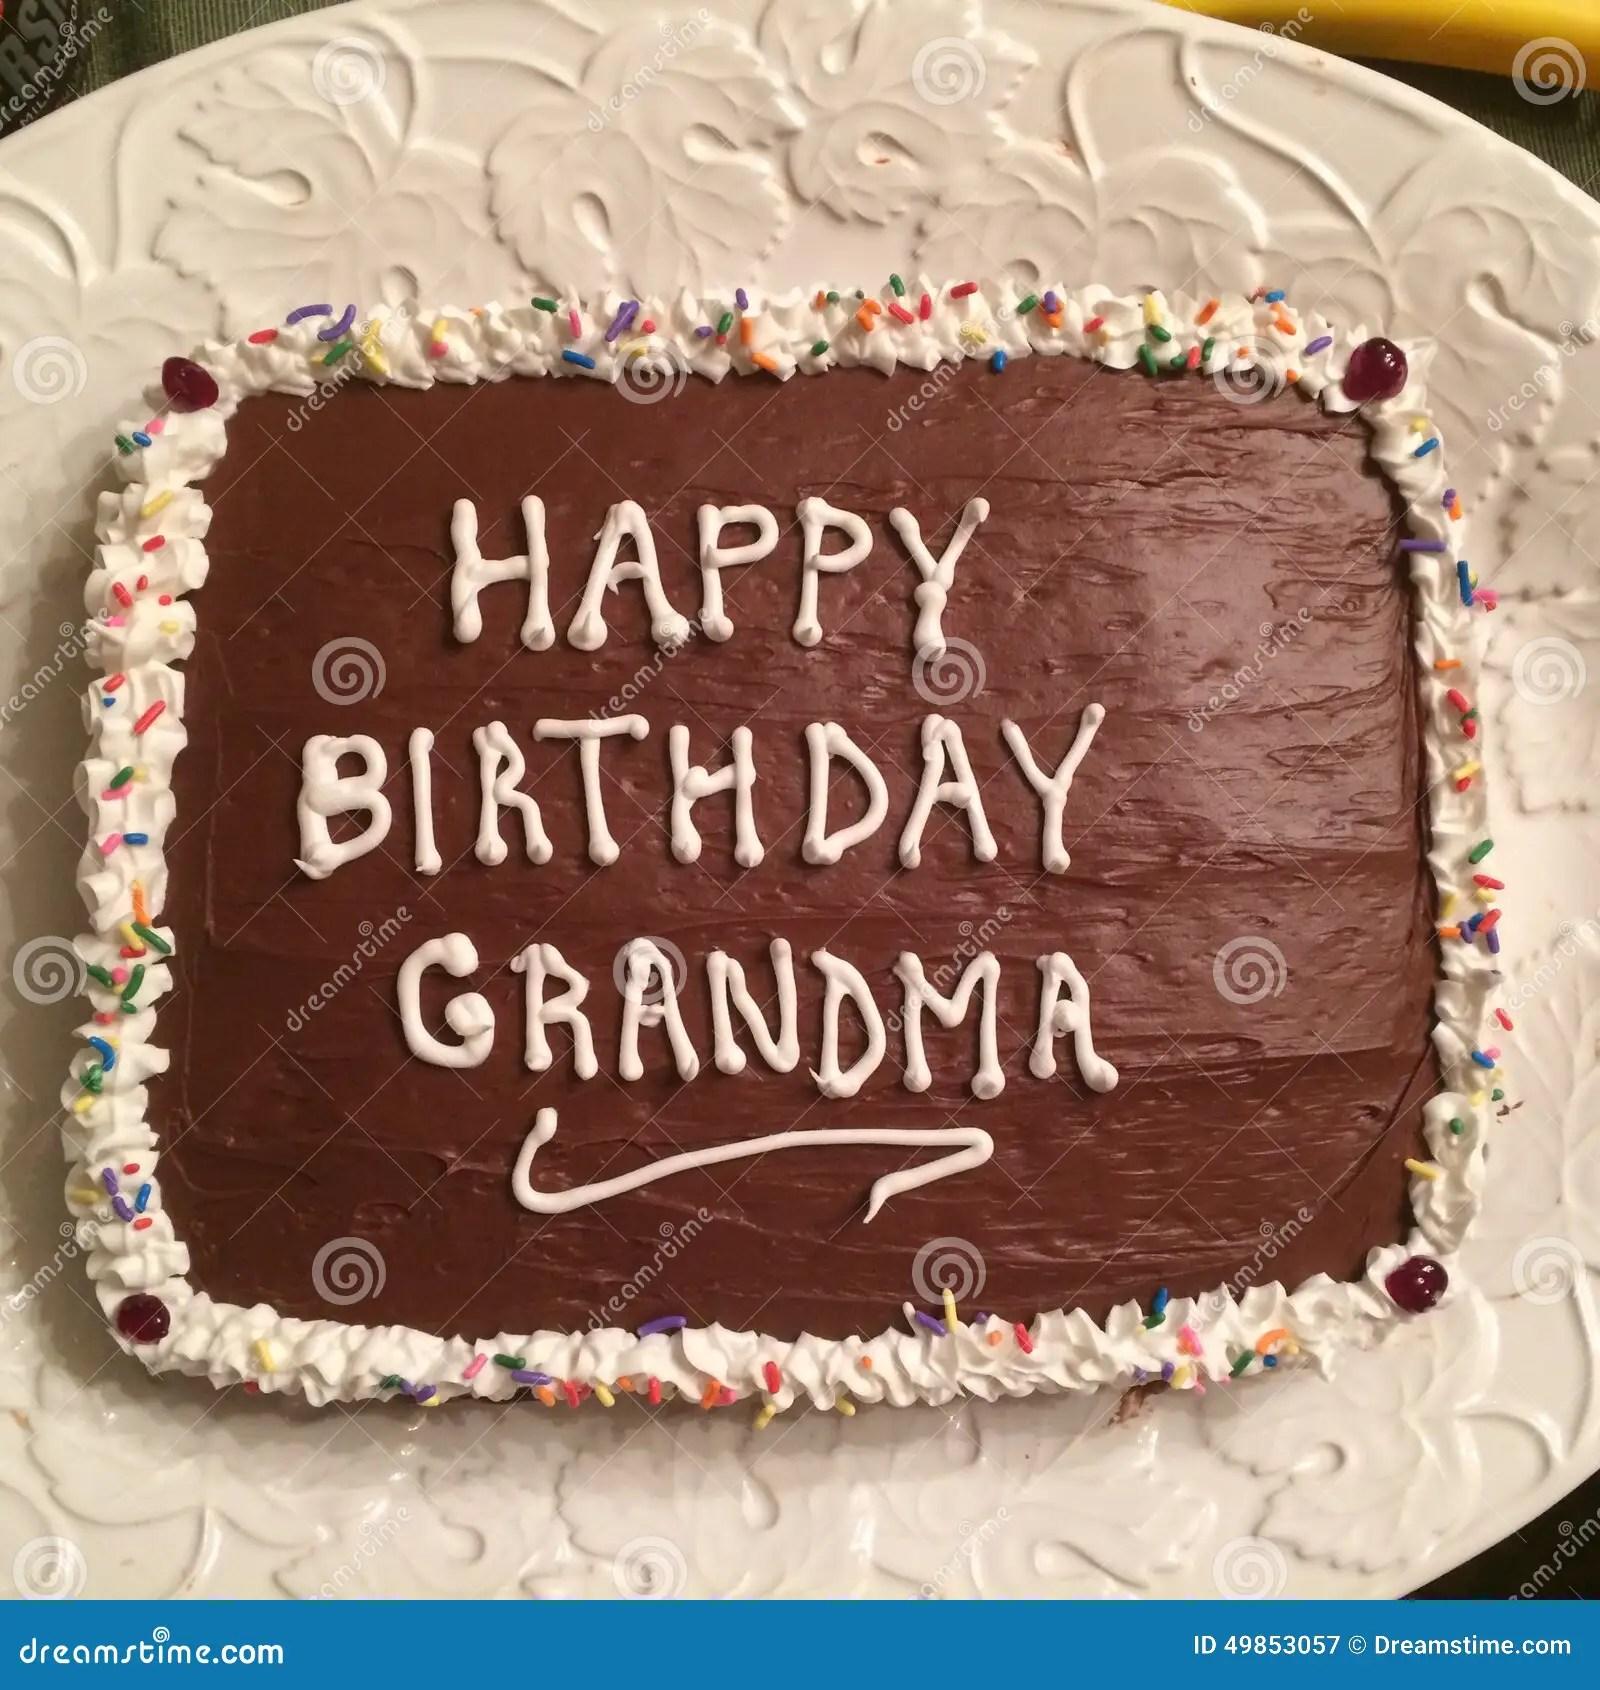 Homemade Cake Stock Image Image Of Grandma Homemade 49853057